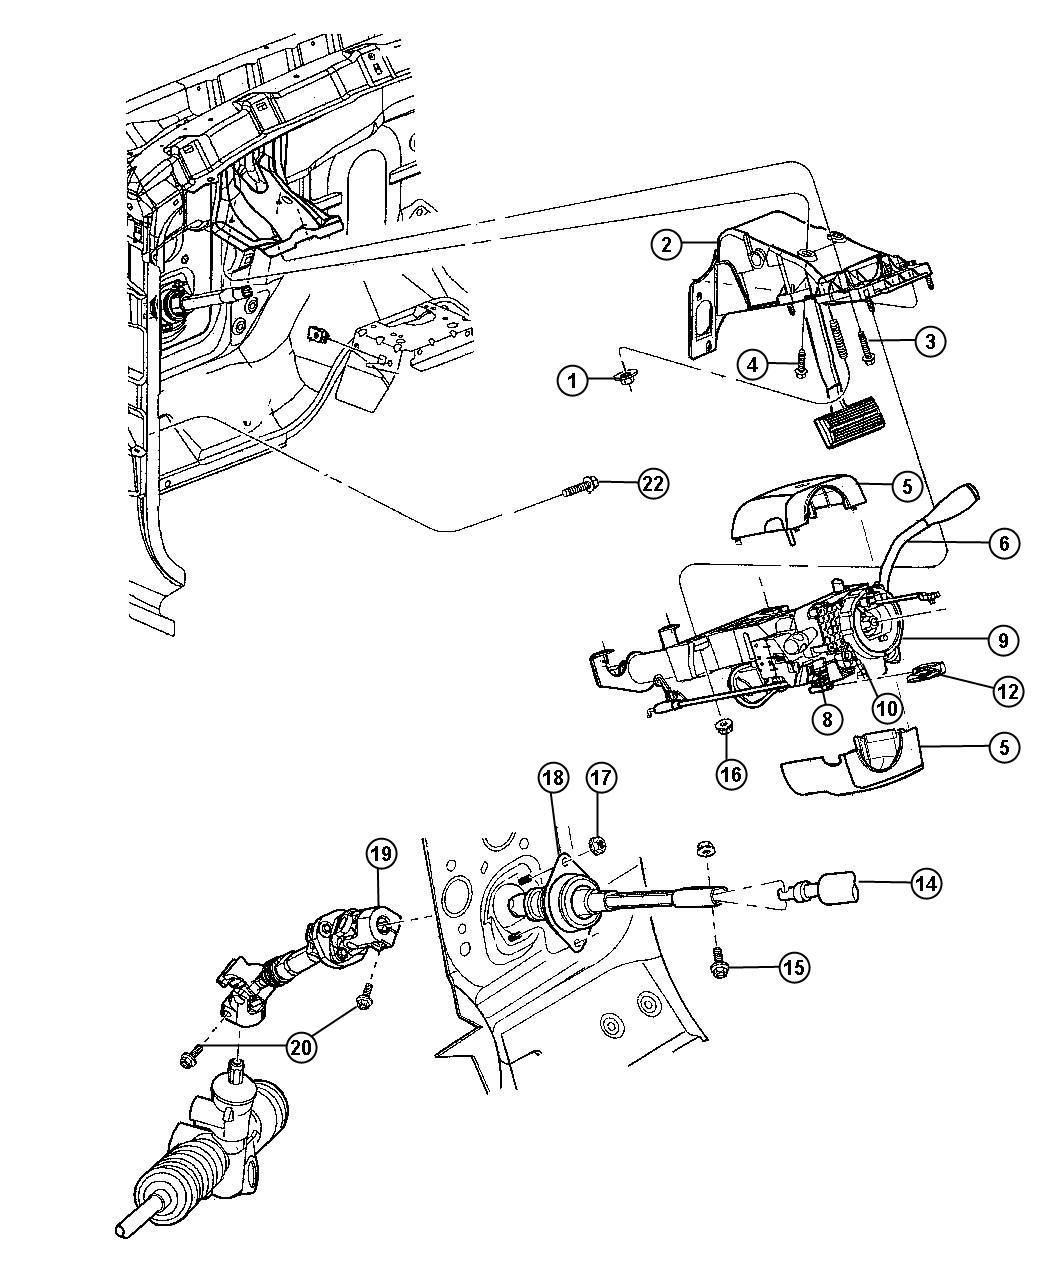 Dodge Ram 1500 Steering Parts Diagram